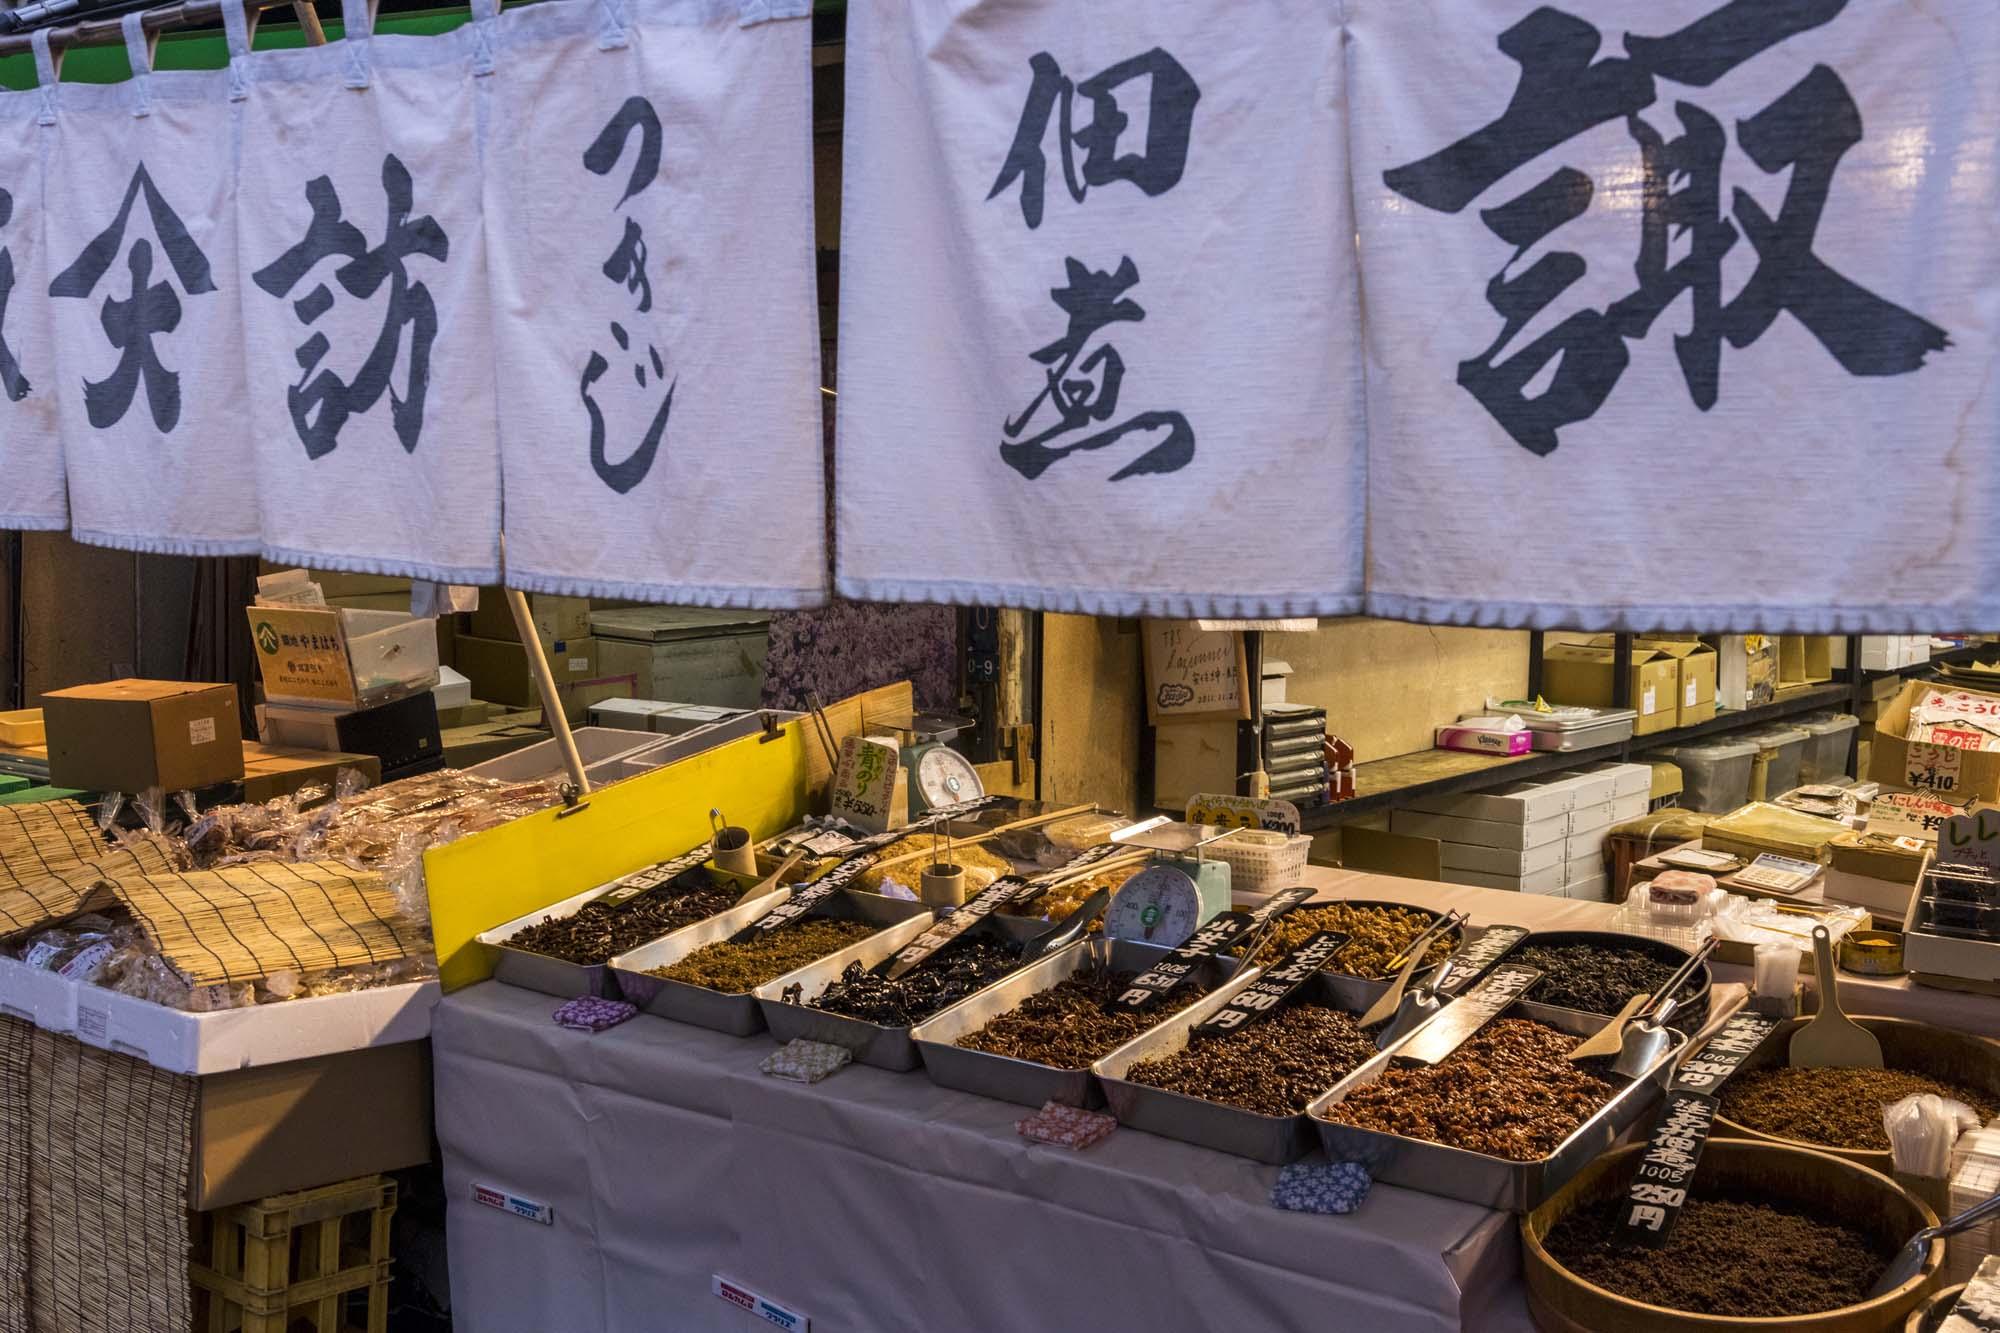 Tsukiji shijō dans la ville de Tōkyō au Japon